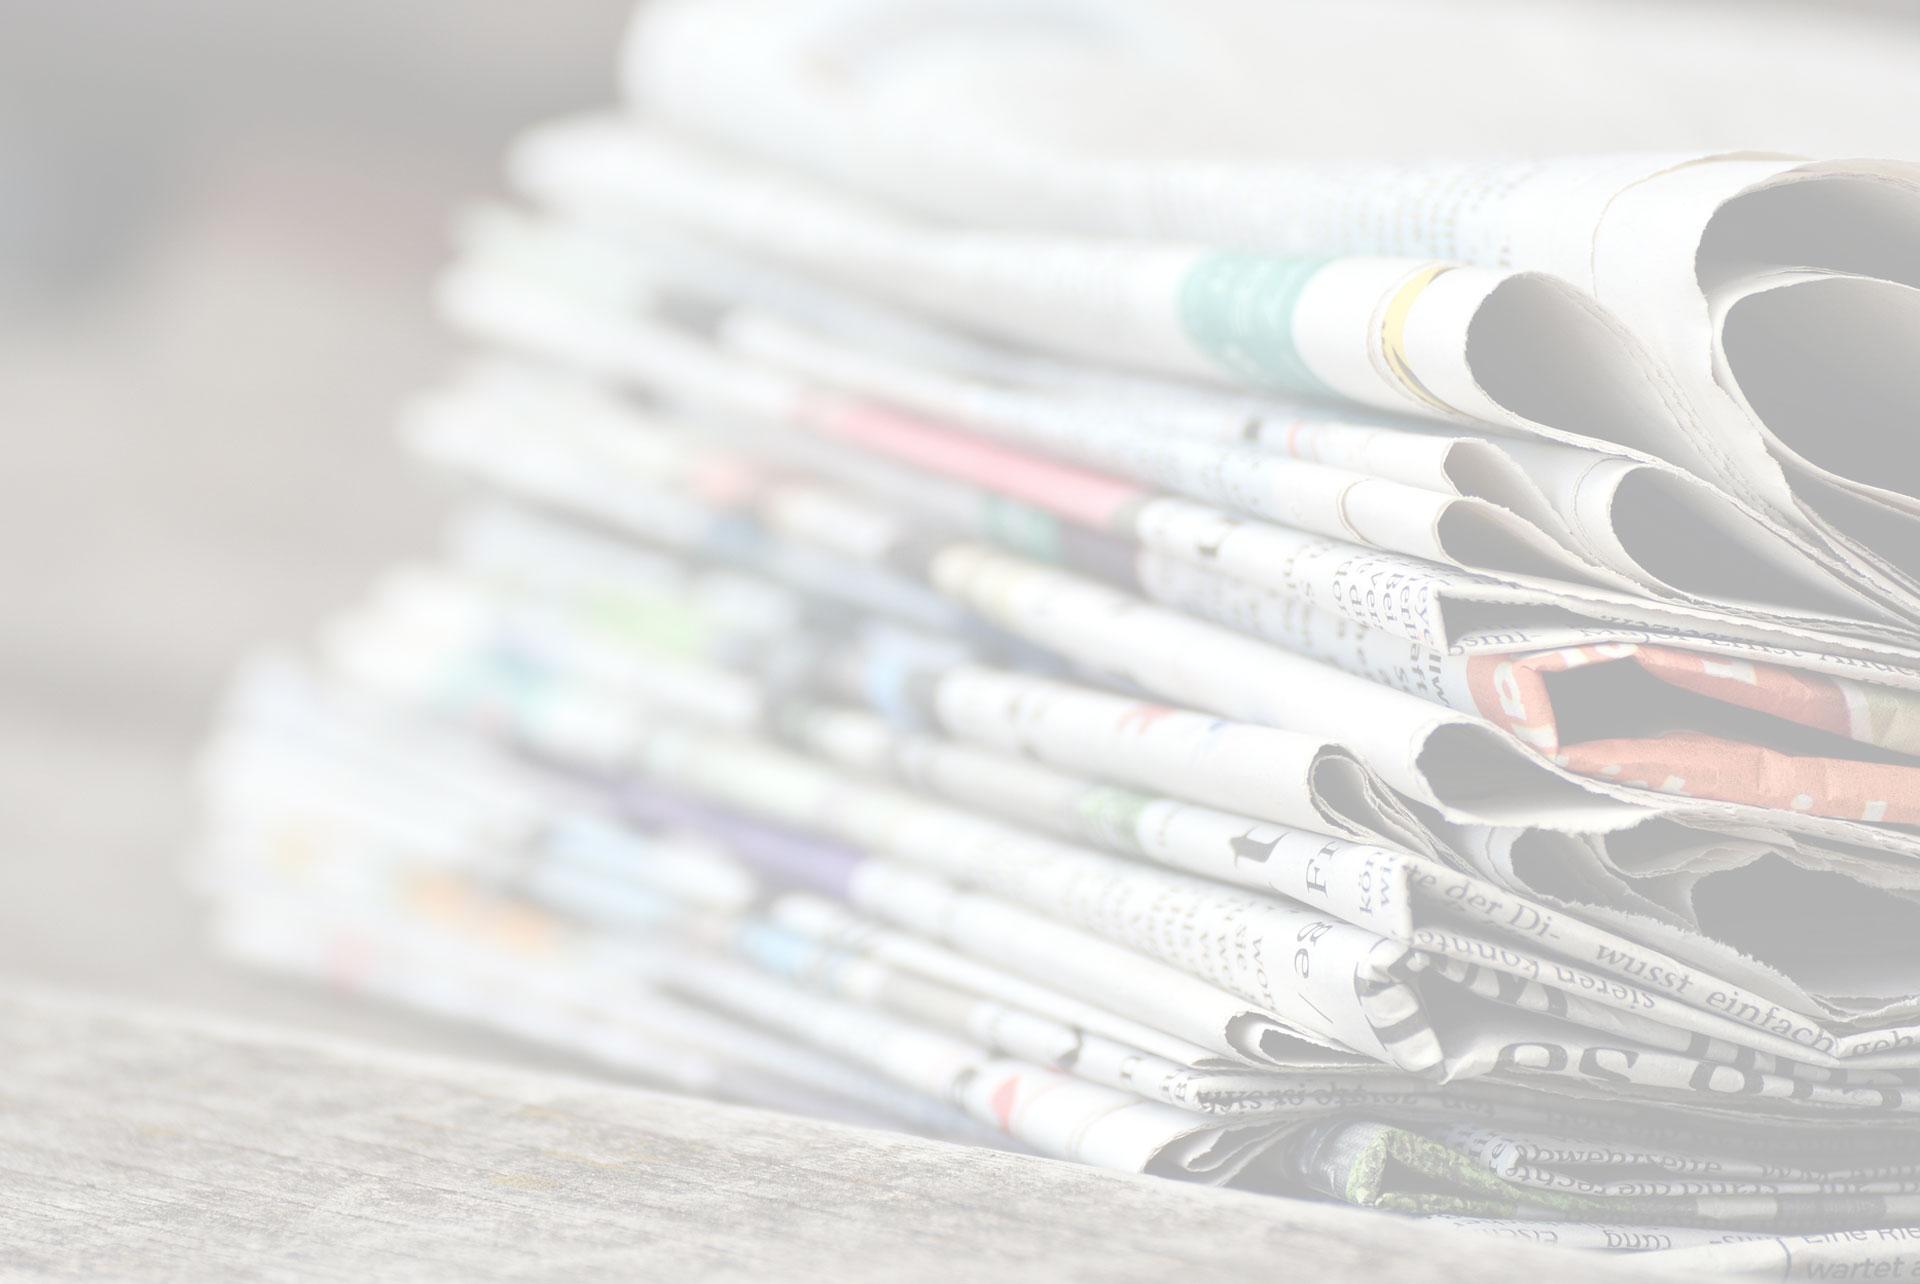 viaggio israele rischi